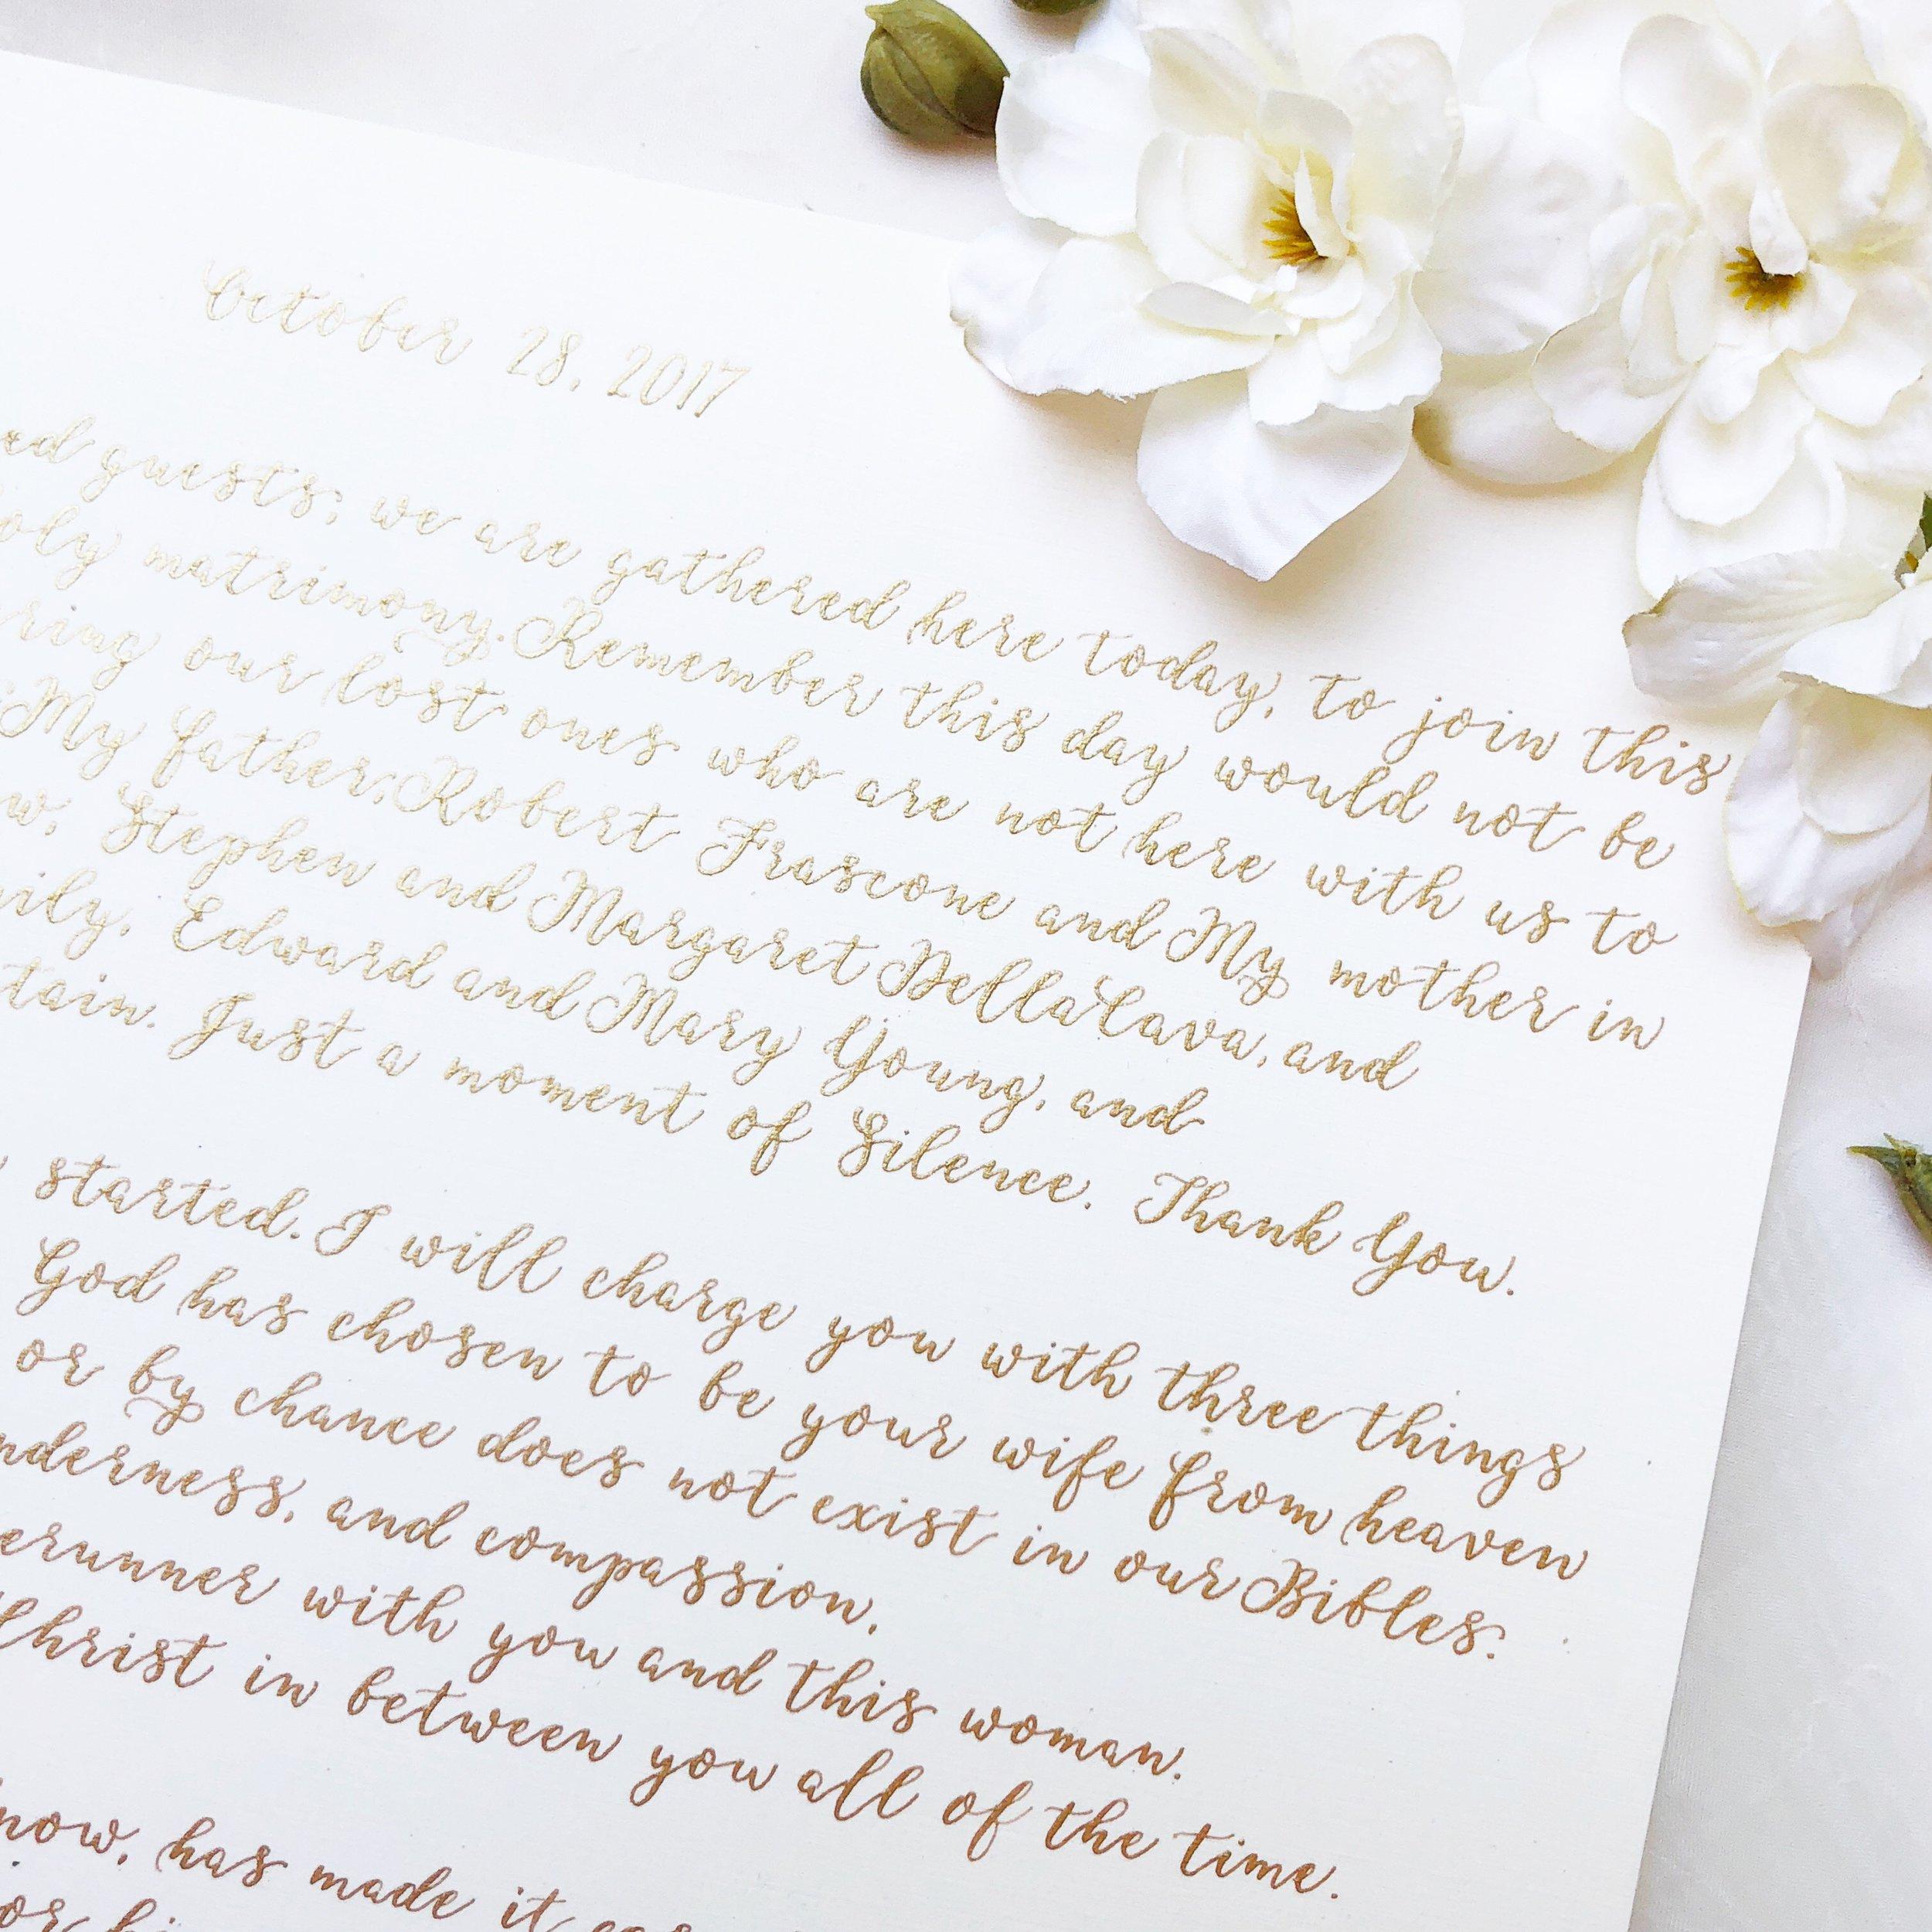 Central PA, York PA, JesSmith Designs, custom, wedding, invitations, bridal, Harrisburg, hanover, calligraphy, baltimore, wedding invitations, lancaster, gettysburg, 06-12 18.45.43.jpg